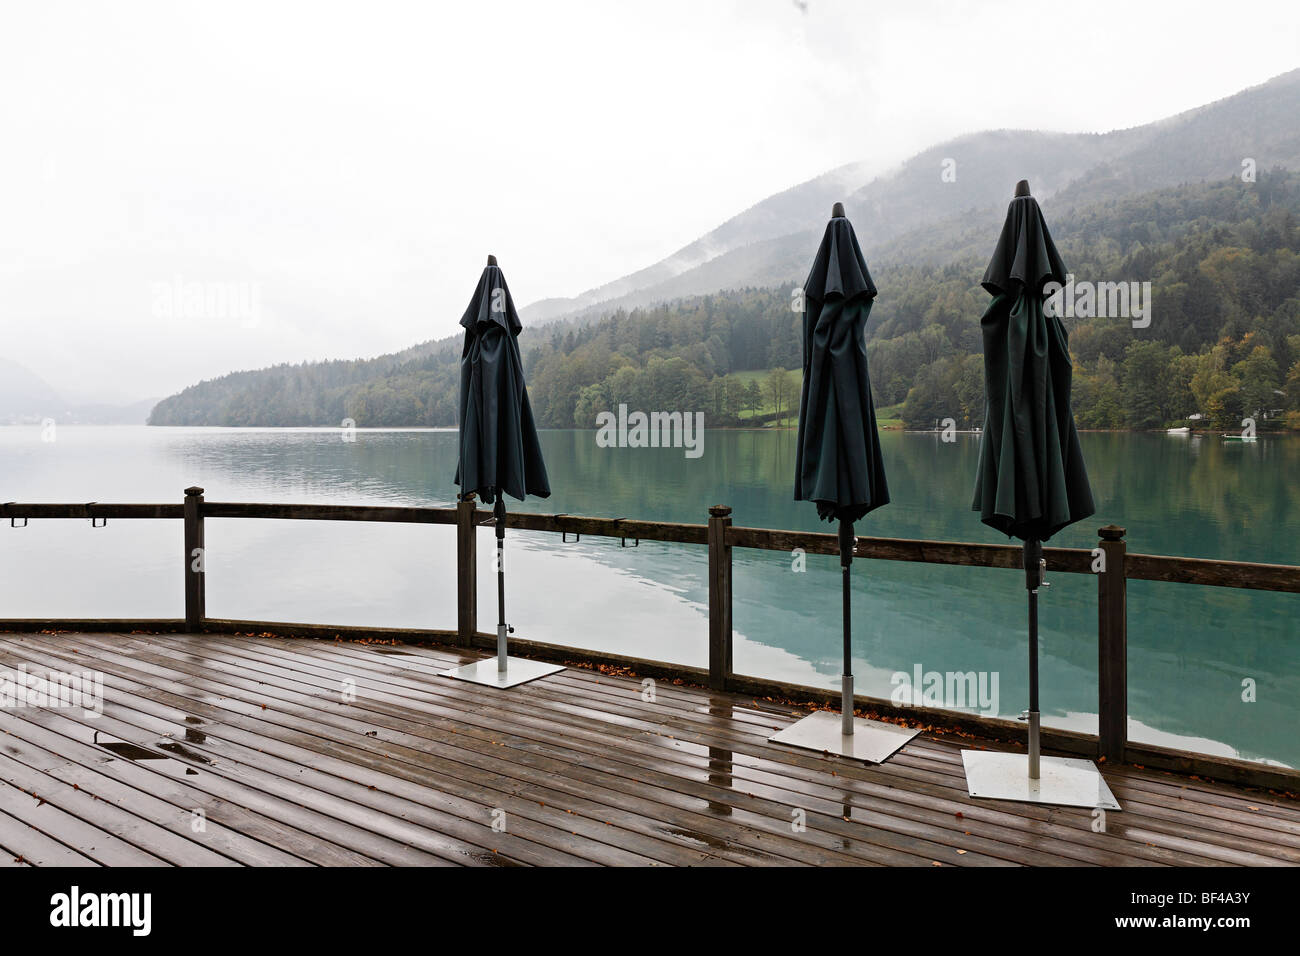 Three closed parasols, terrace on the lake, overcast sky, rainy, dreary atmosphere, Fuschlsee lake, Salzkammergut - Stock Image